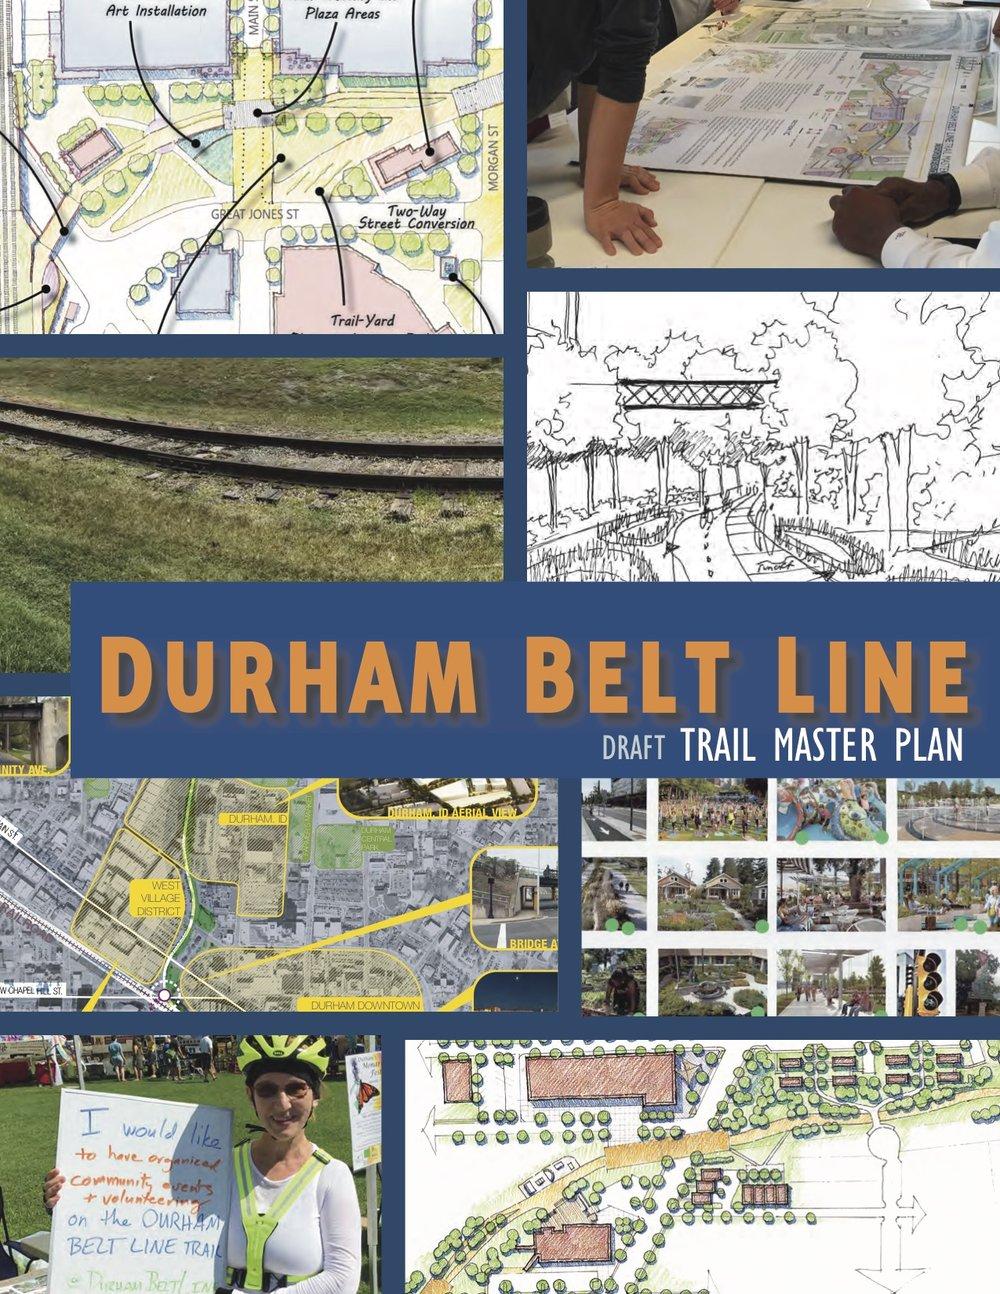 DRAFT_DurhamBeltLineMasterPlan_04-24-2018_SpreadRed (1).jpg